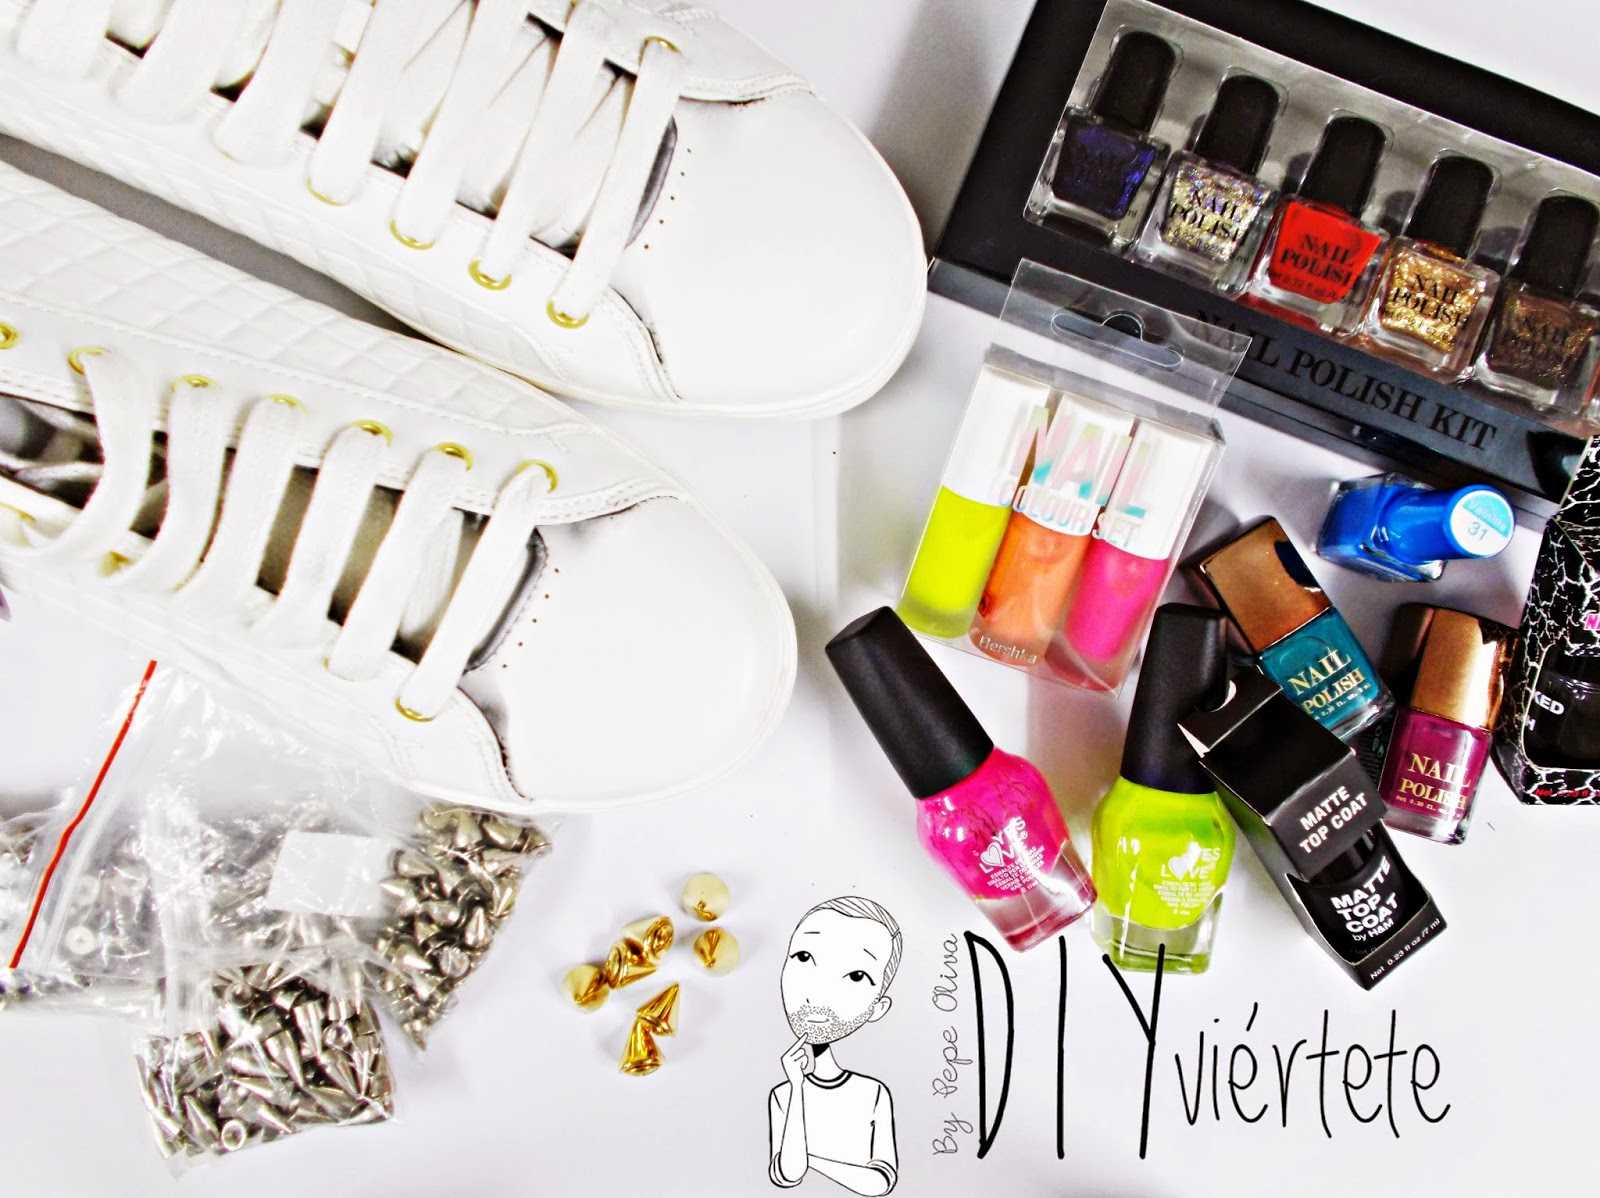 DIY-zapatillas-tunear-customizar-CHRISTIAN-LOUBOUTIN-zapatos-pinchos-esmaltes-pinta uñas-colores-4